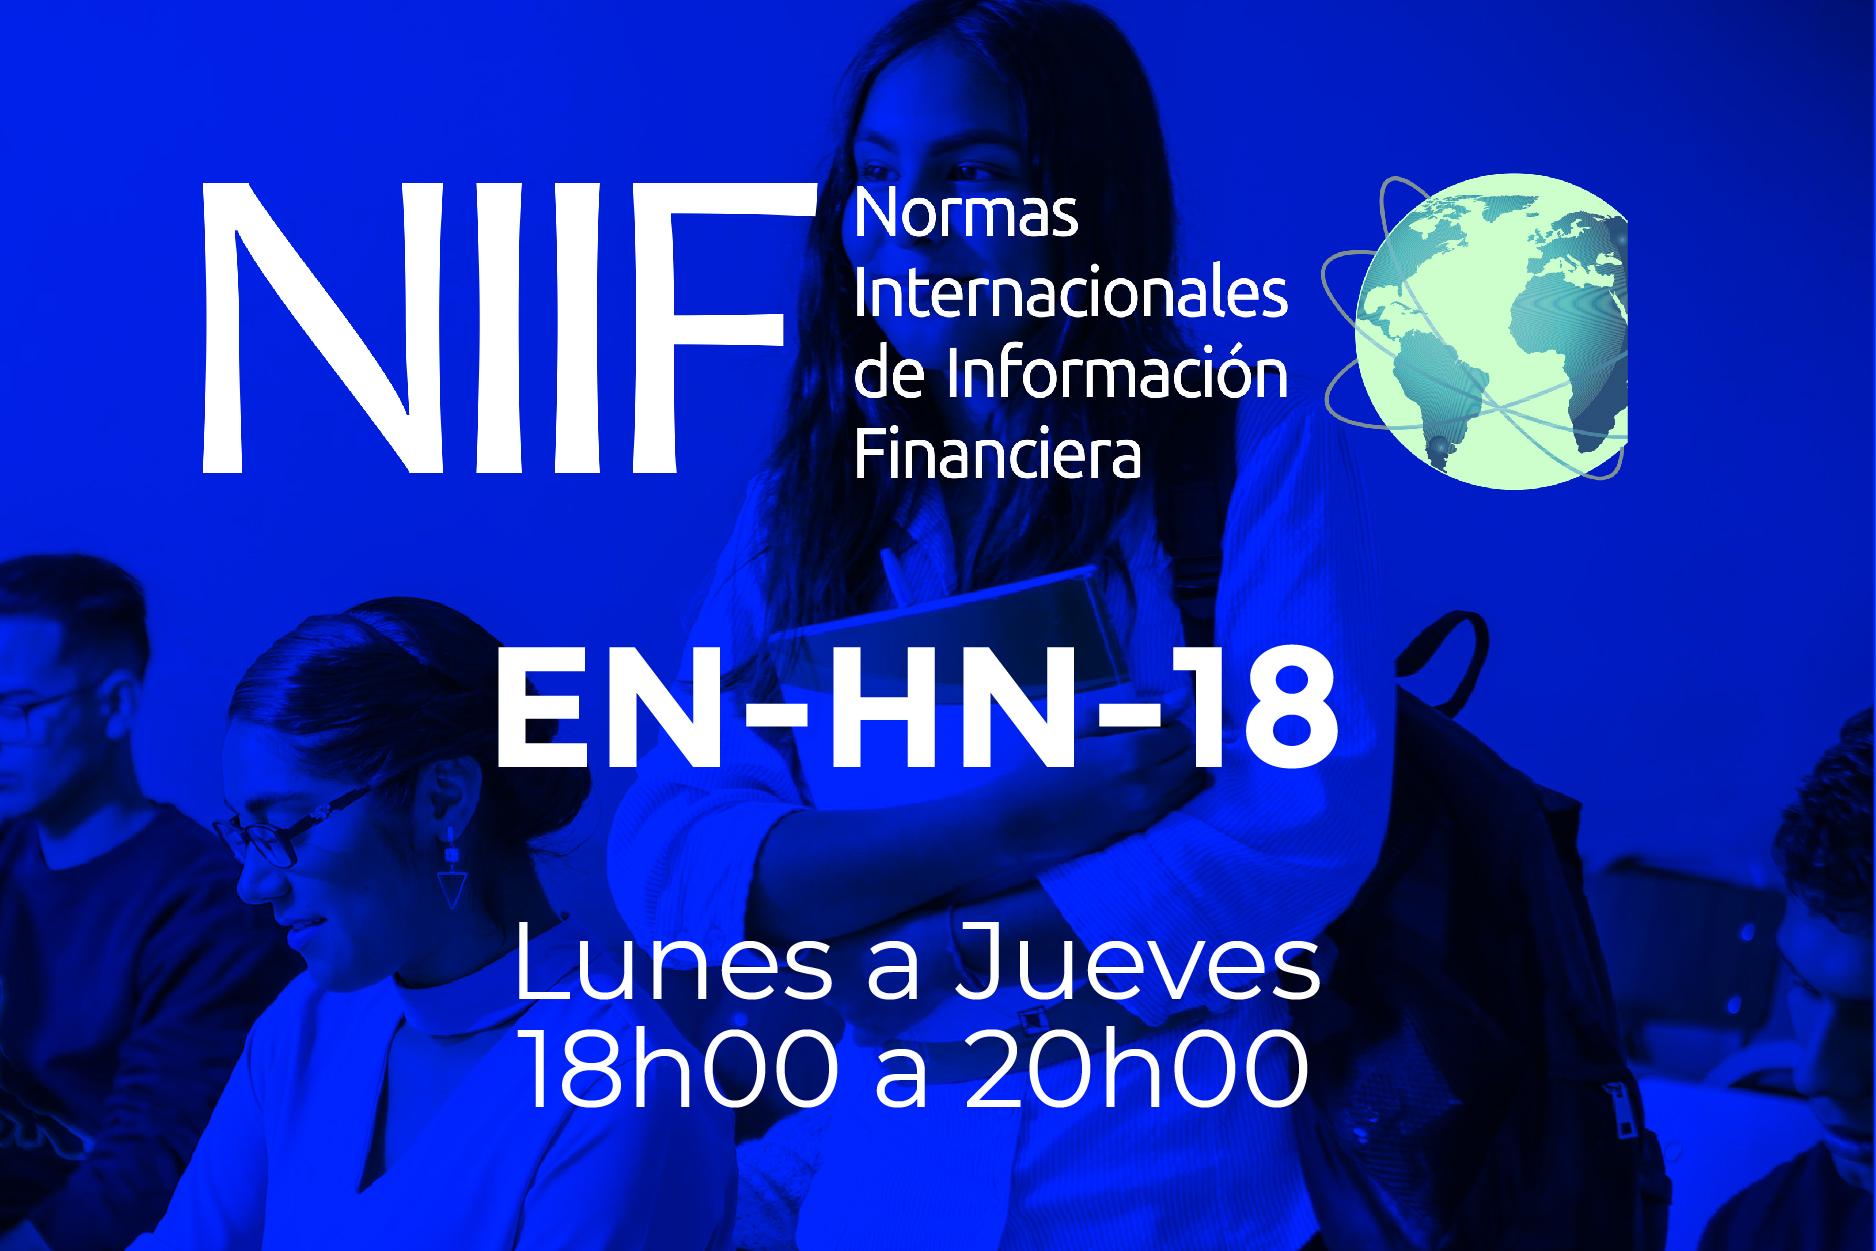 18 - NIIF - LUNES A JUEVES - 18:00 A 20:00